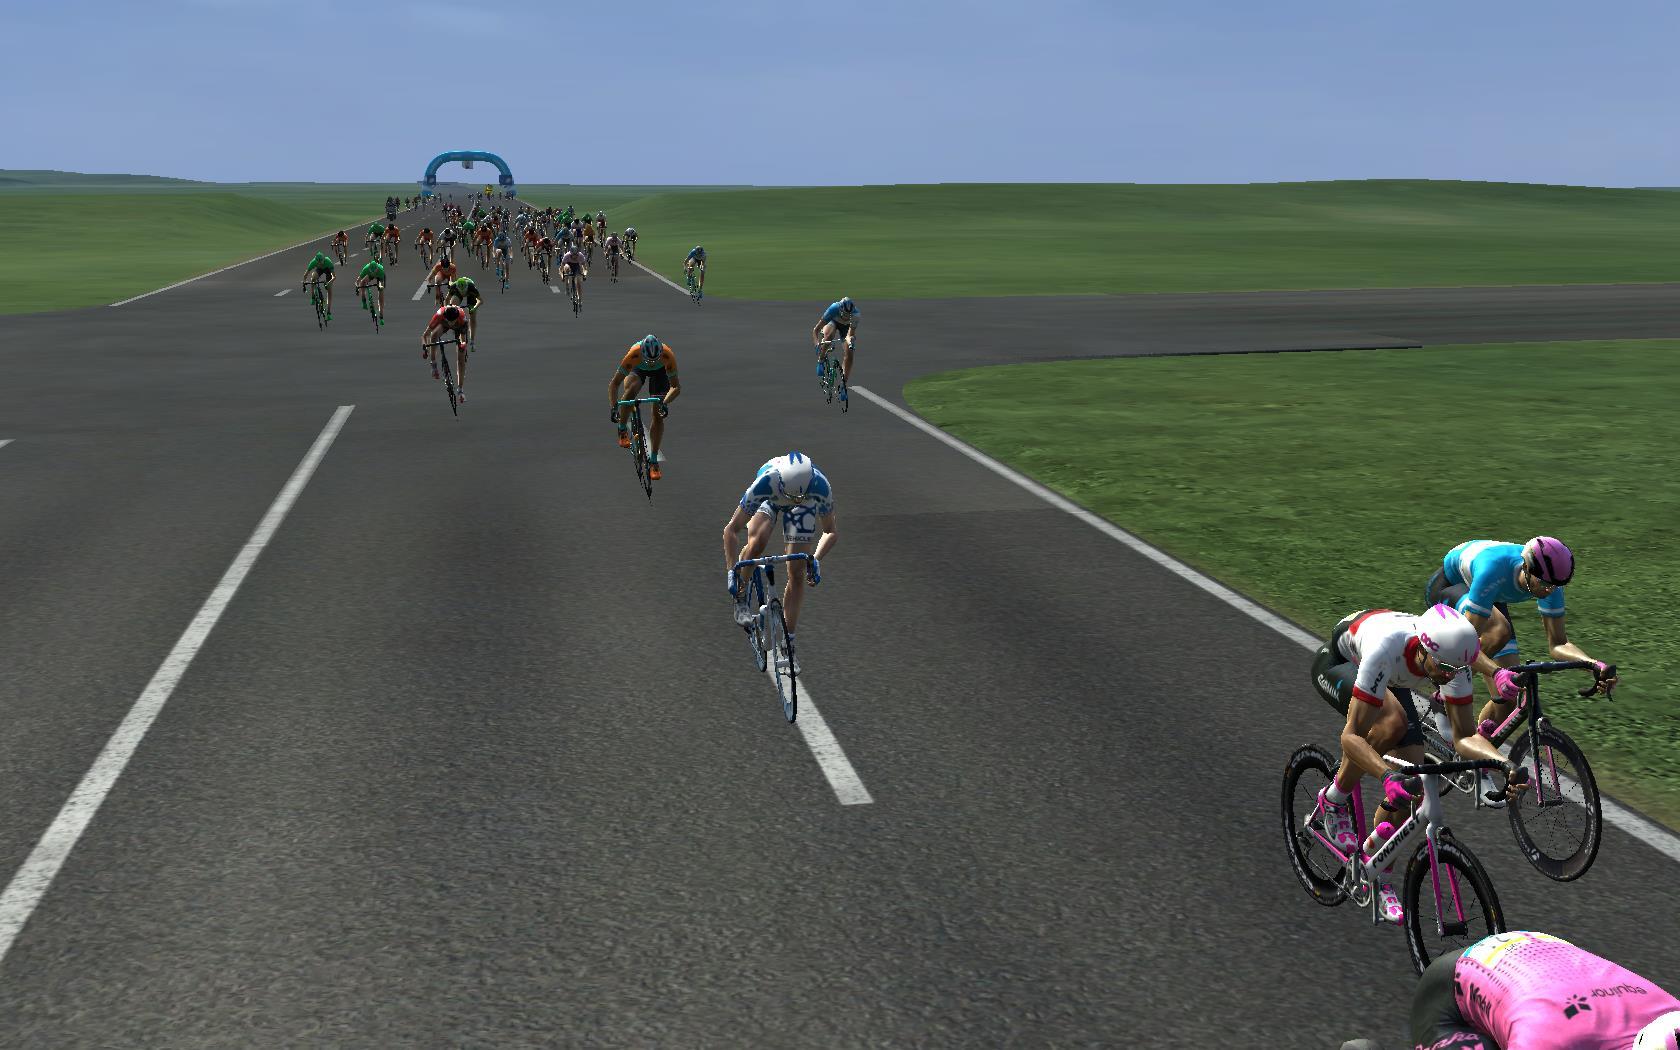 pcmdaily.com/images/mg/2018/Races/C2/USAPCC/1/PCM0012.jpg